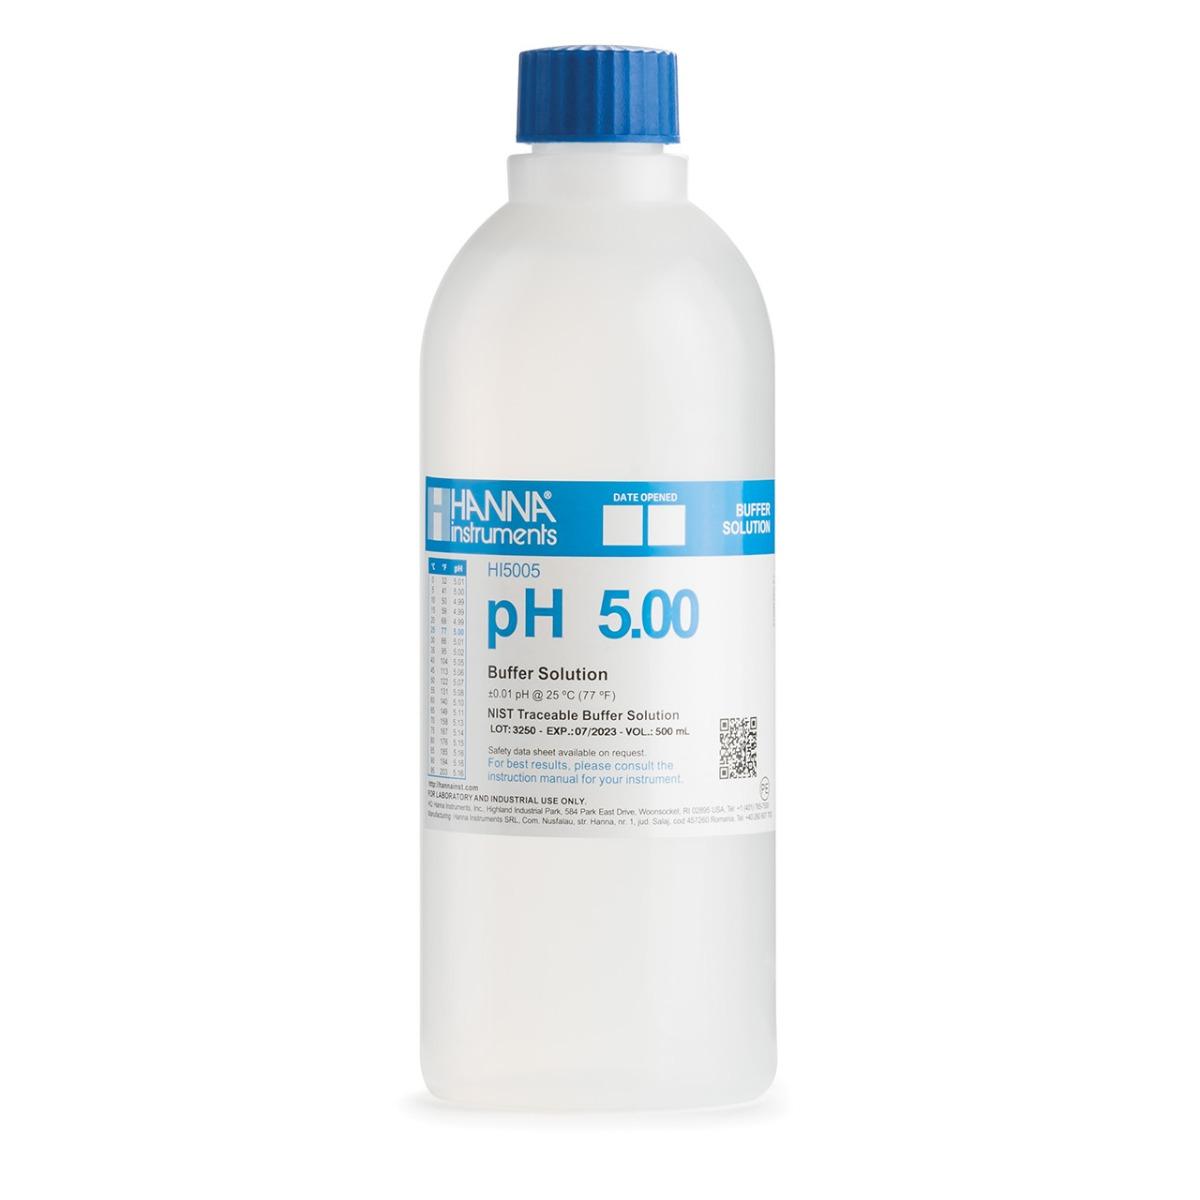 HI5005 pH 5.00 Technical Calibration Buffer (500 mL)